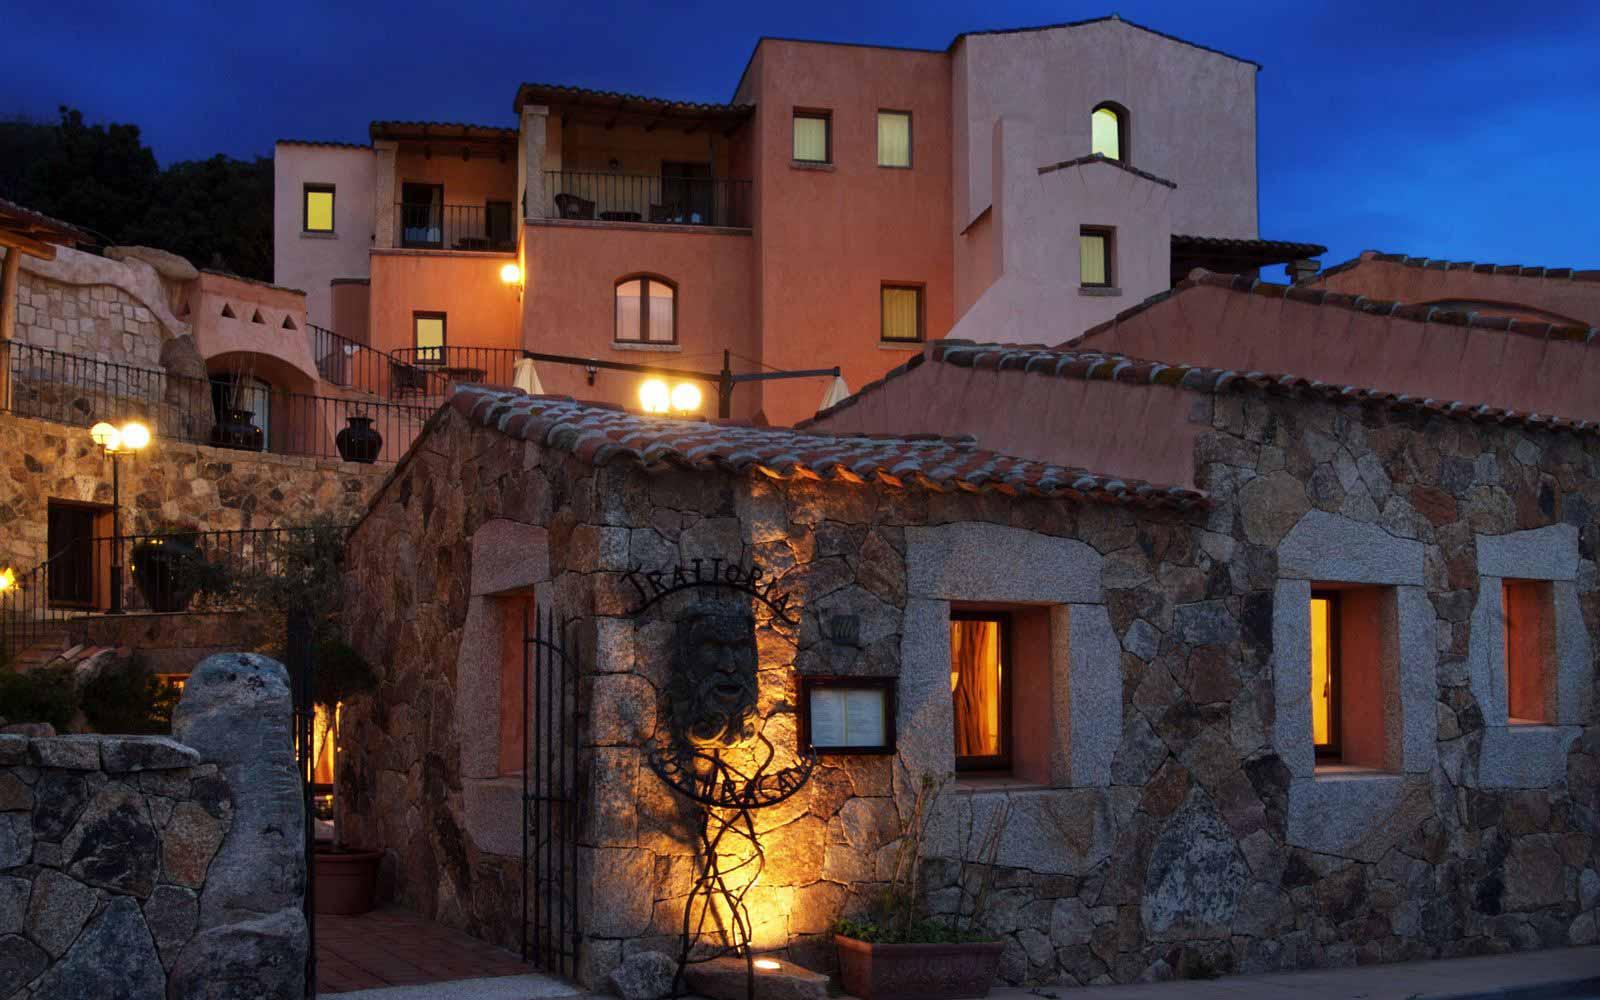 Entrance by night at Hotel Arathena